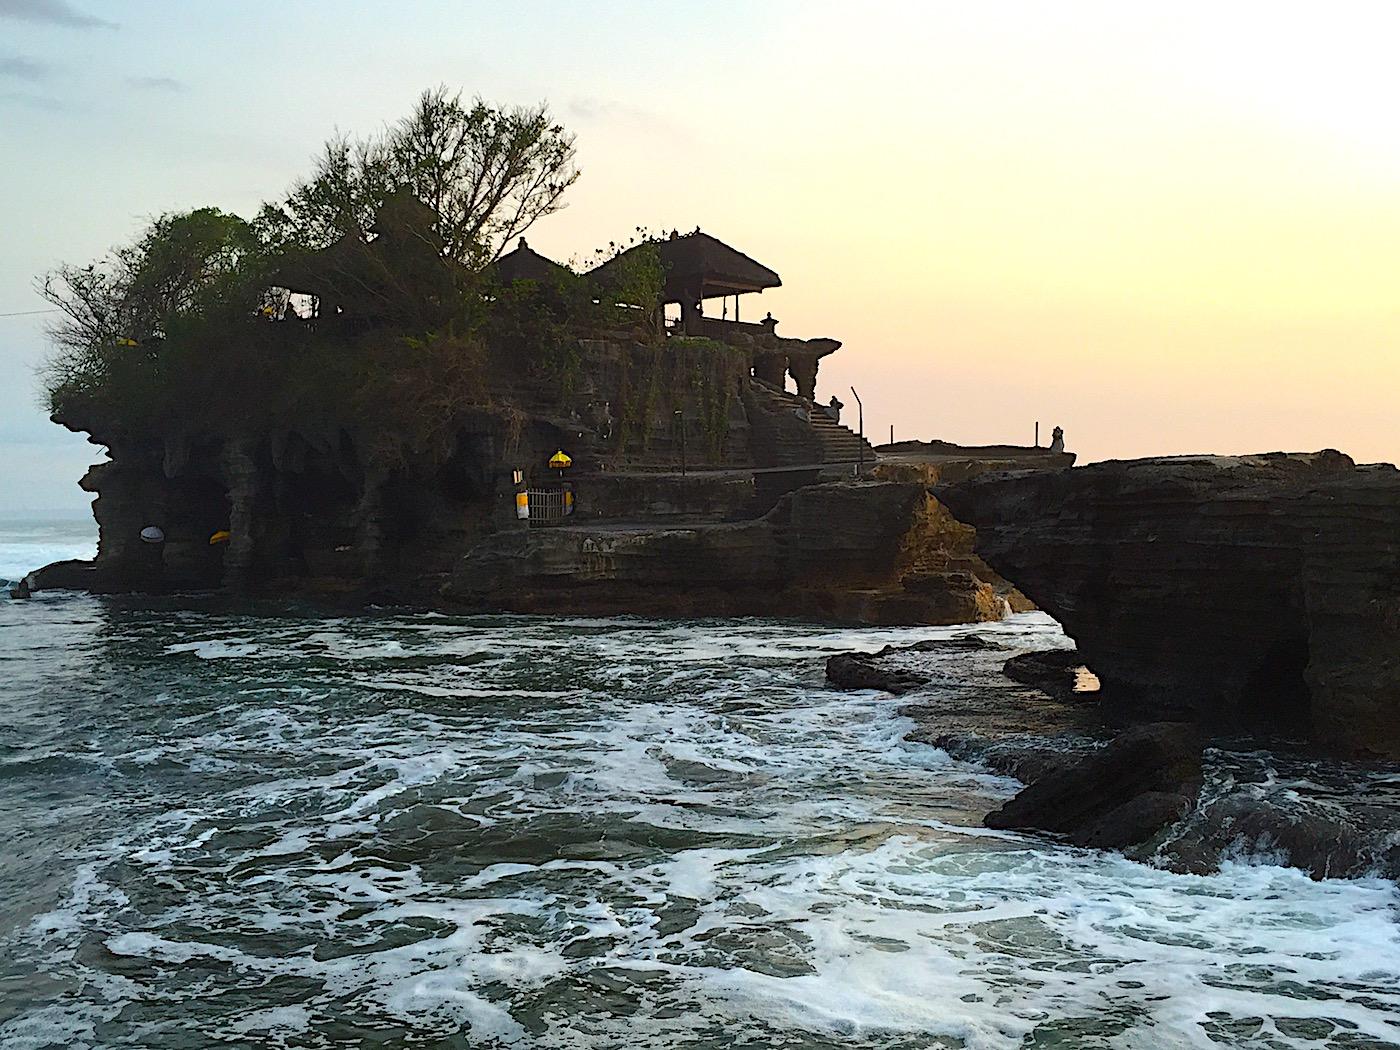 Por do sol em Tanah Lot, Bali. Foto: Patti Neves